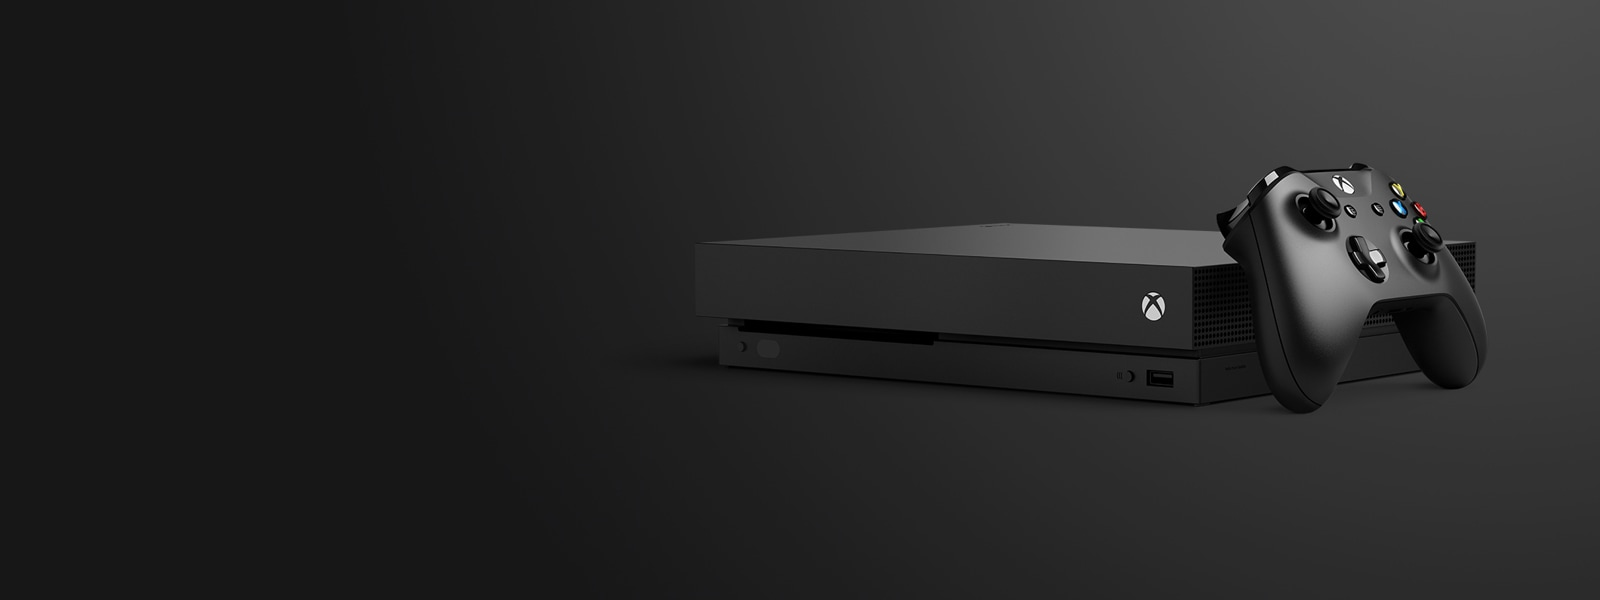 En Xbox One X med kontroller